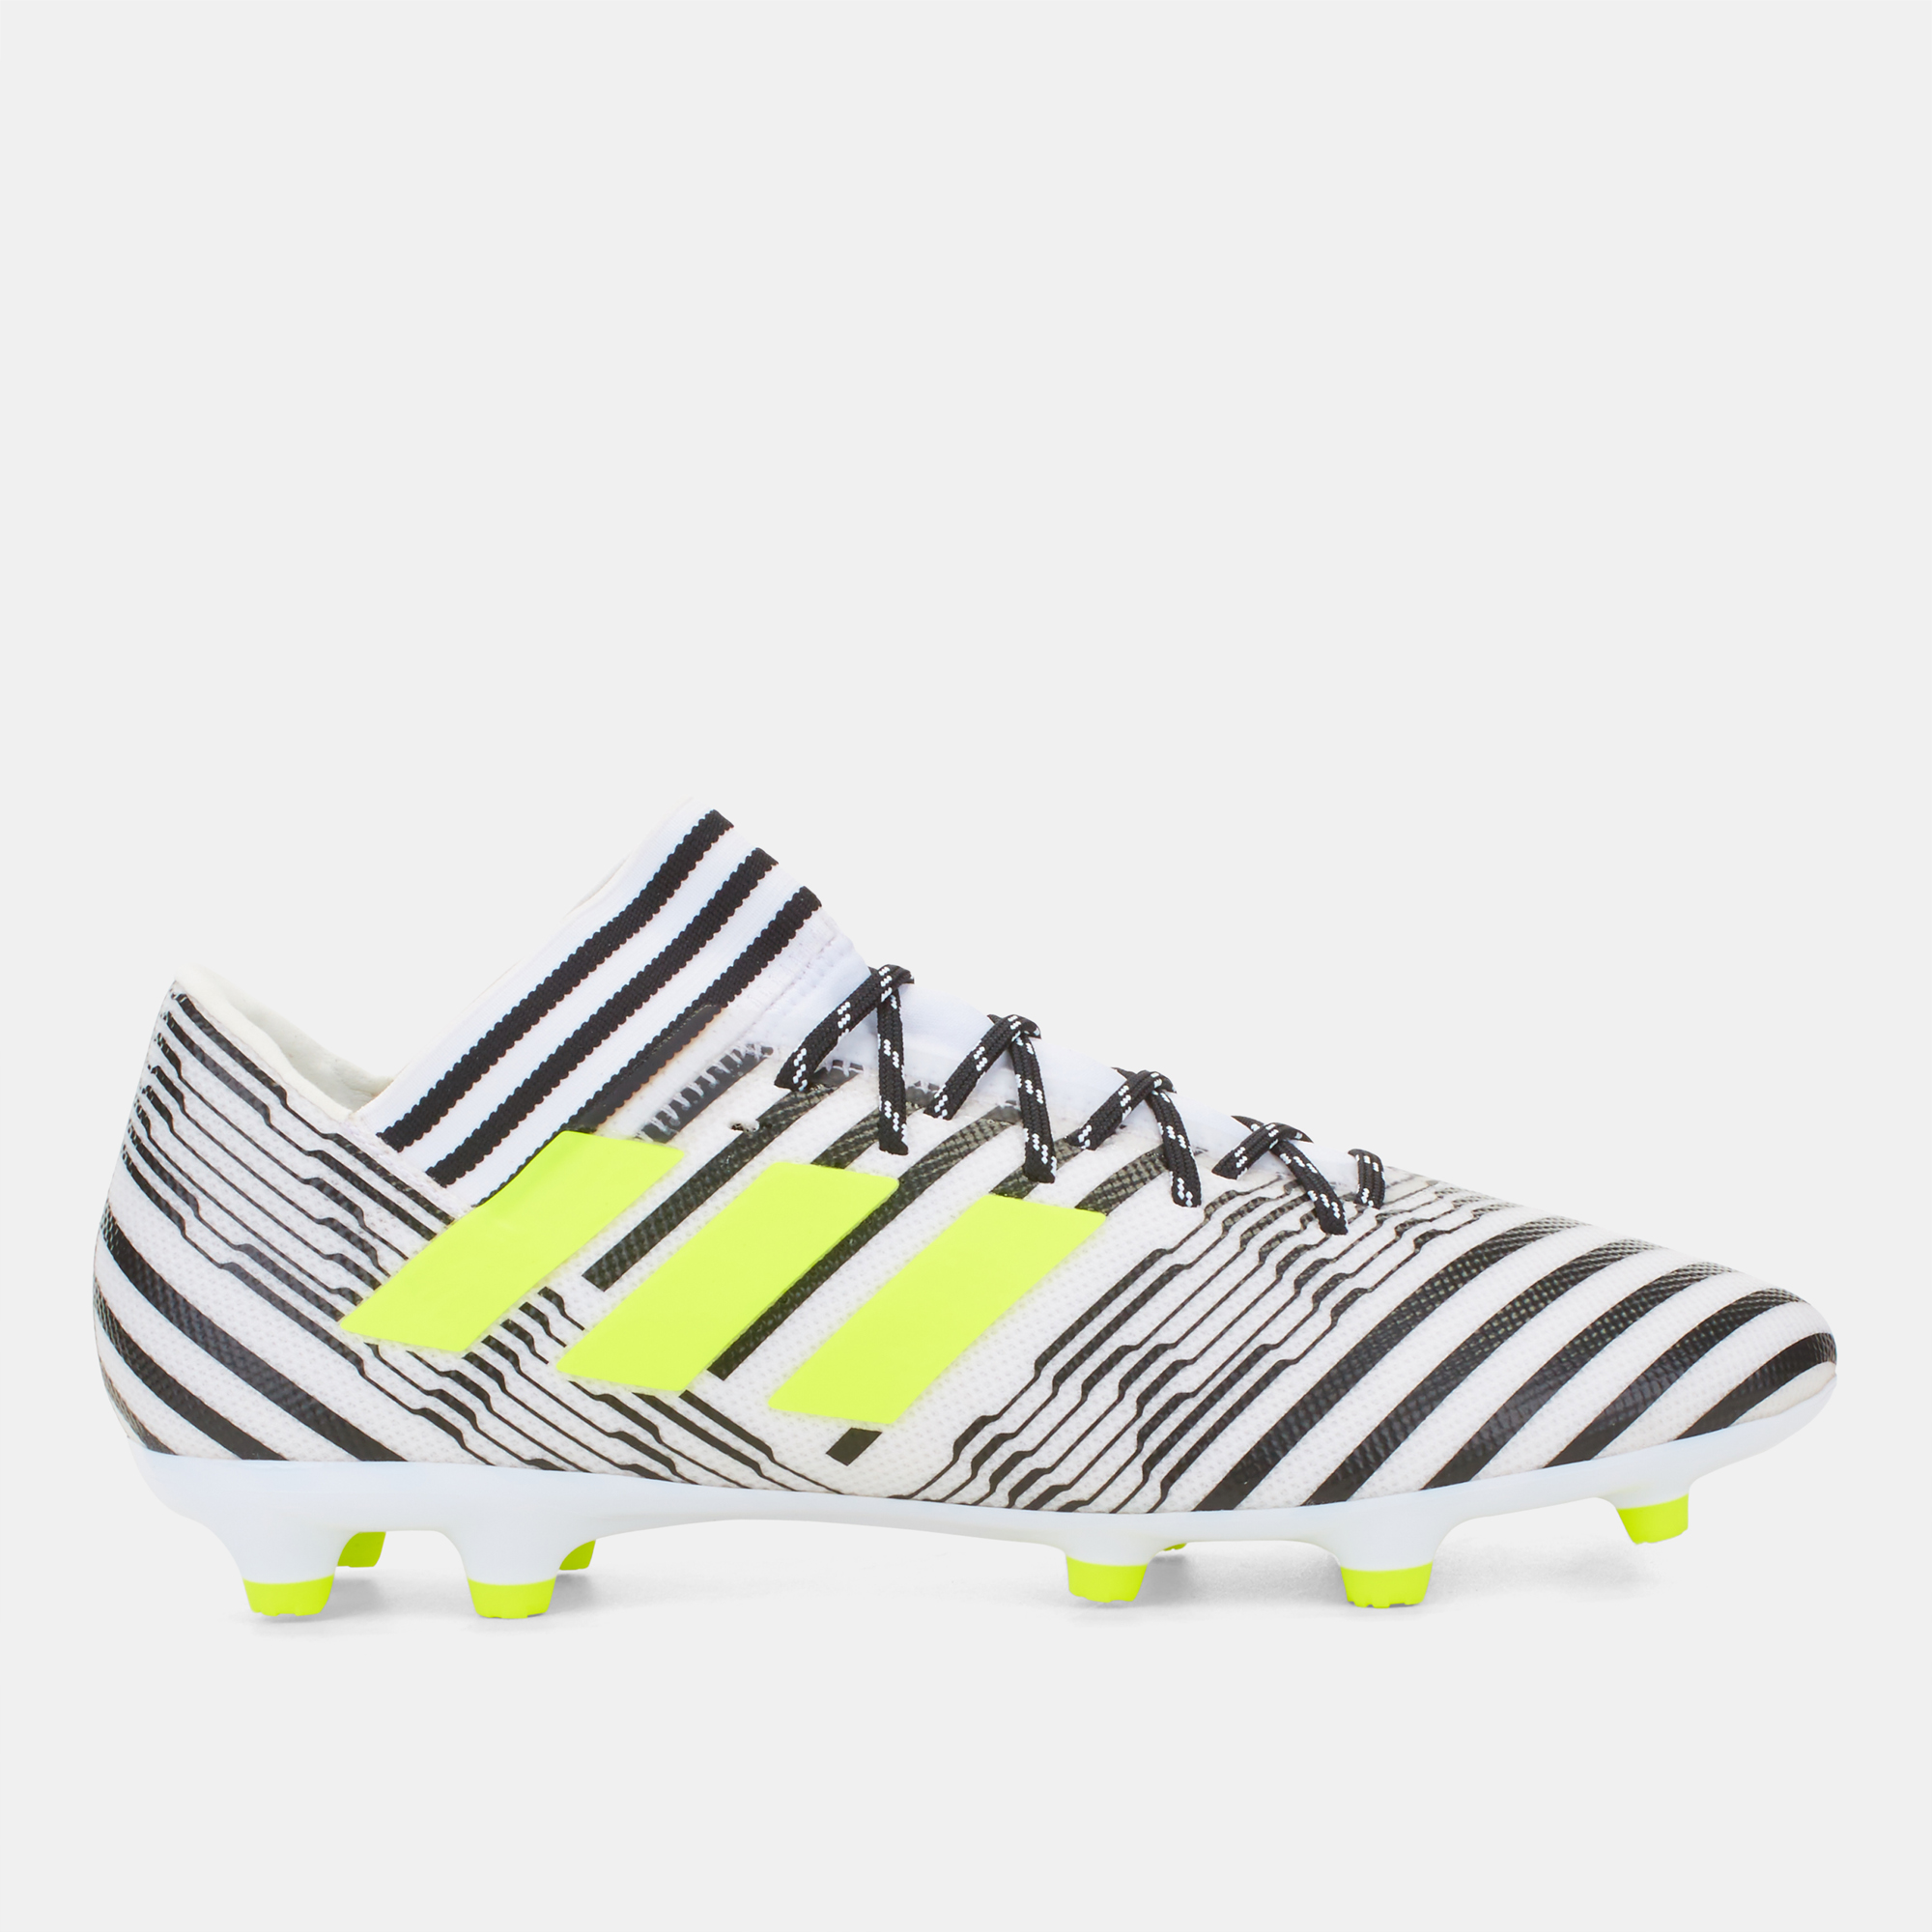 21a72e4ed63d Shop White Shop White Adidas Nemeziz 17.3 Firm Ground Football Shoe  exclusive for Mens by adidas